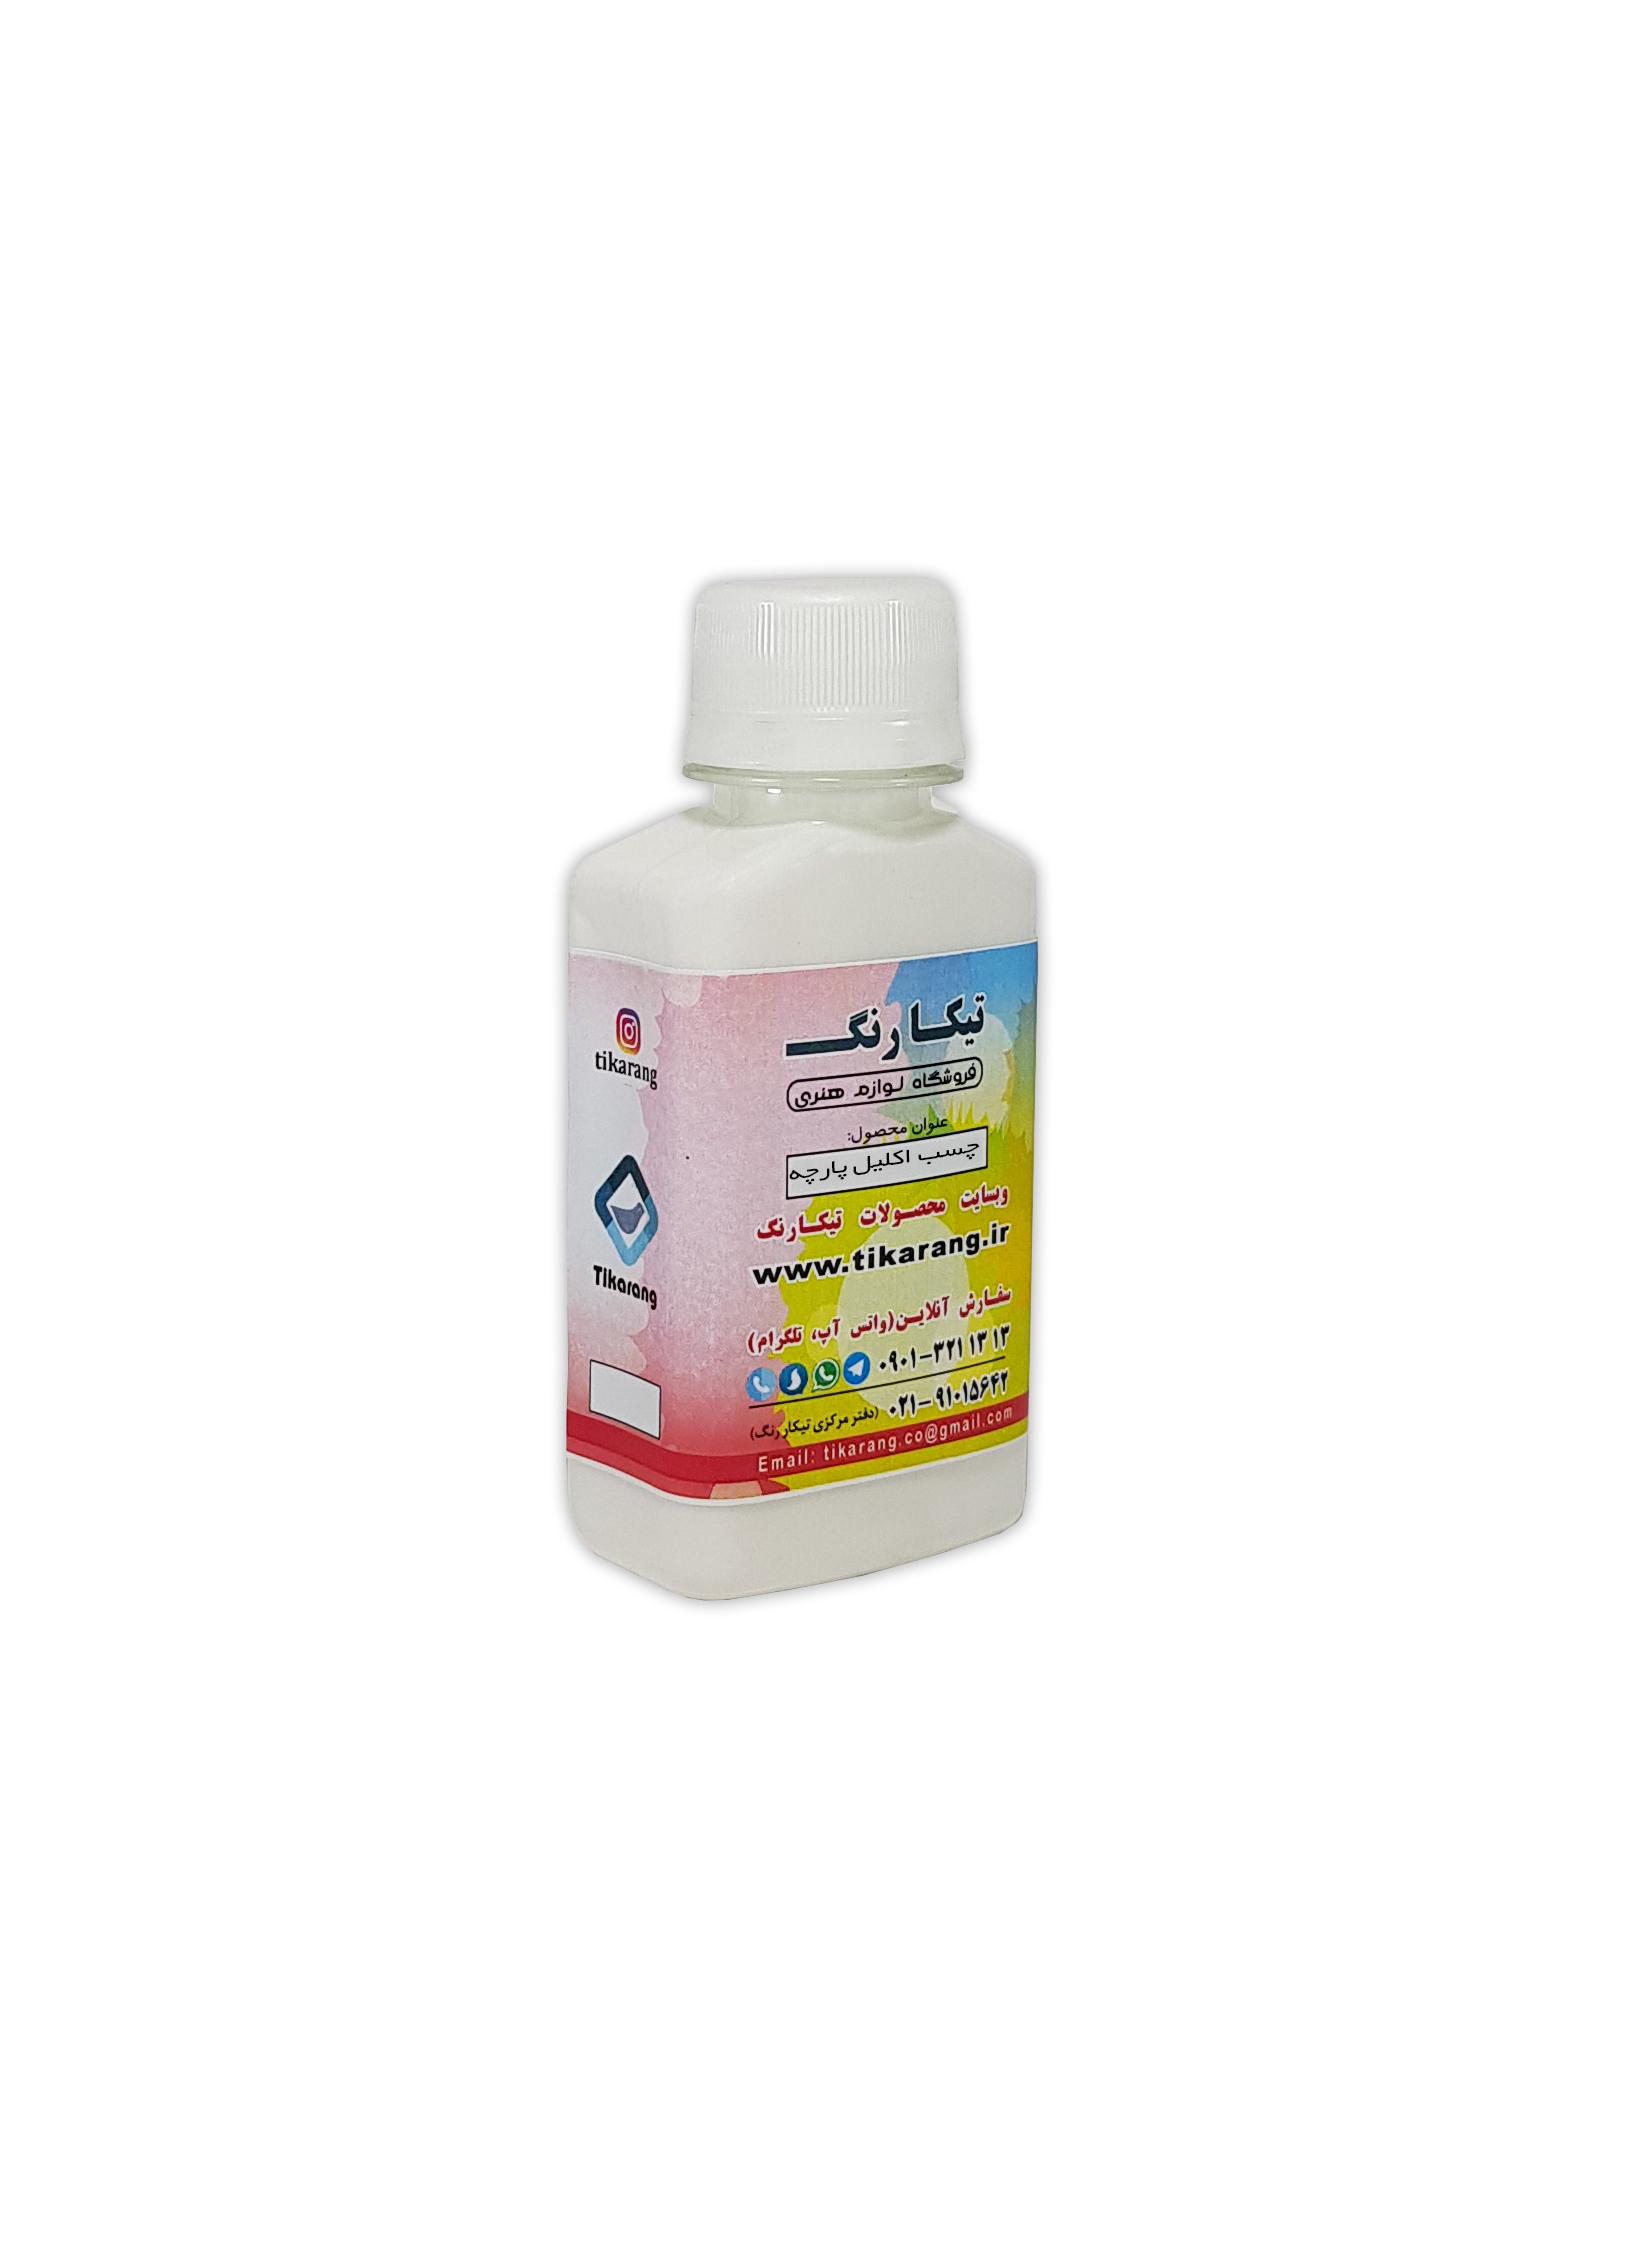 fabric glitter glue 150 gr 2D